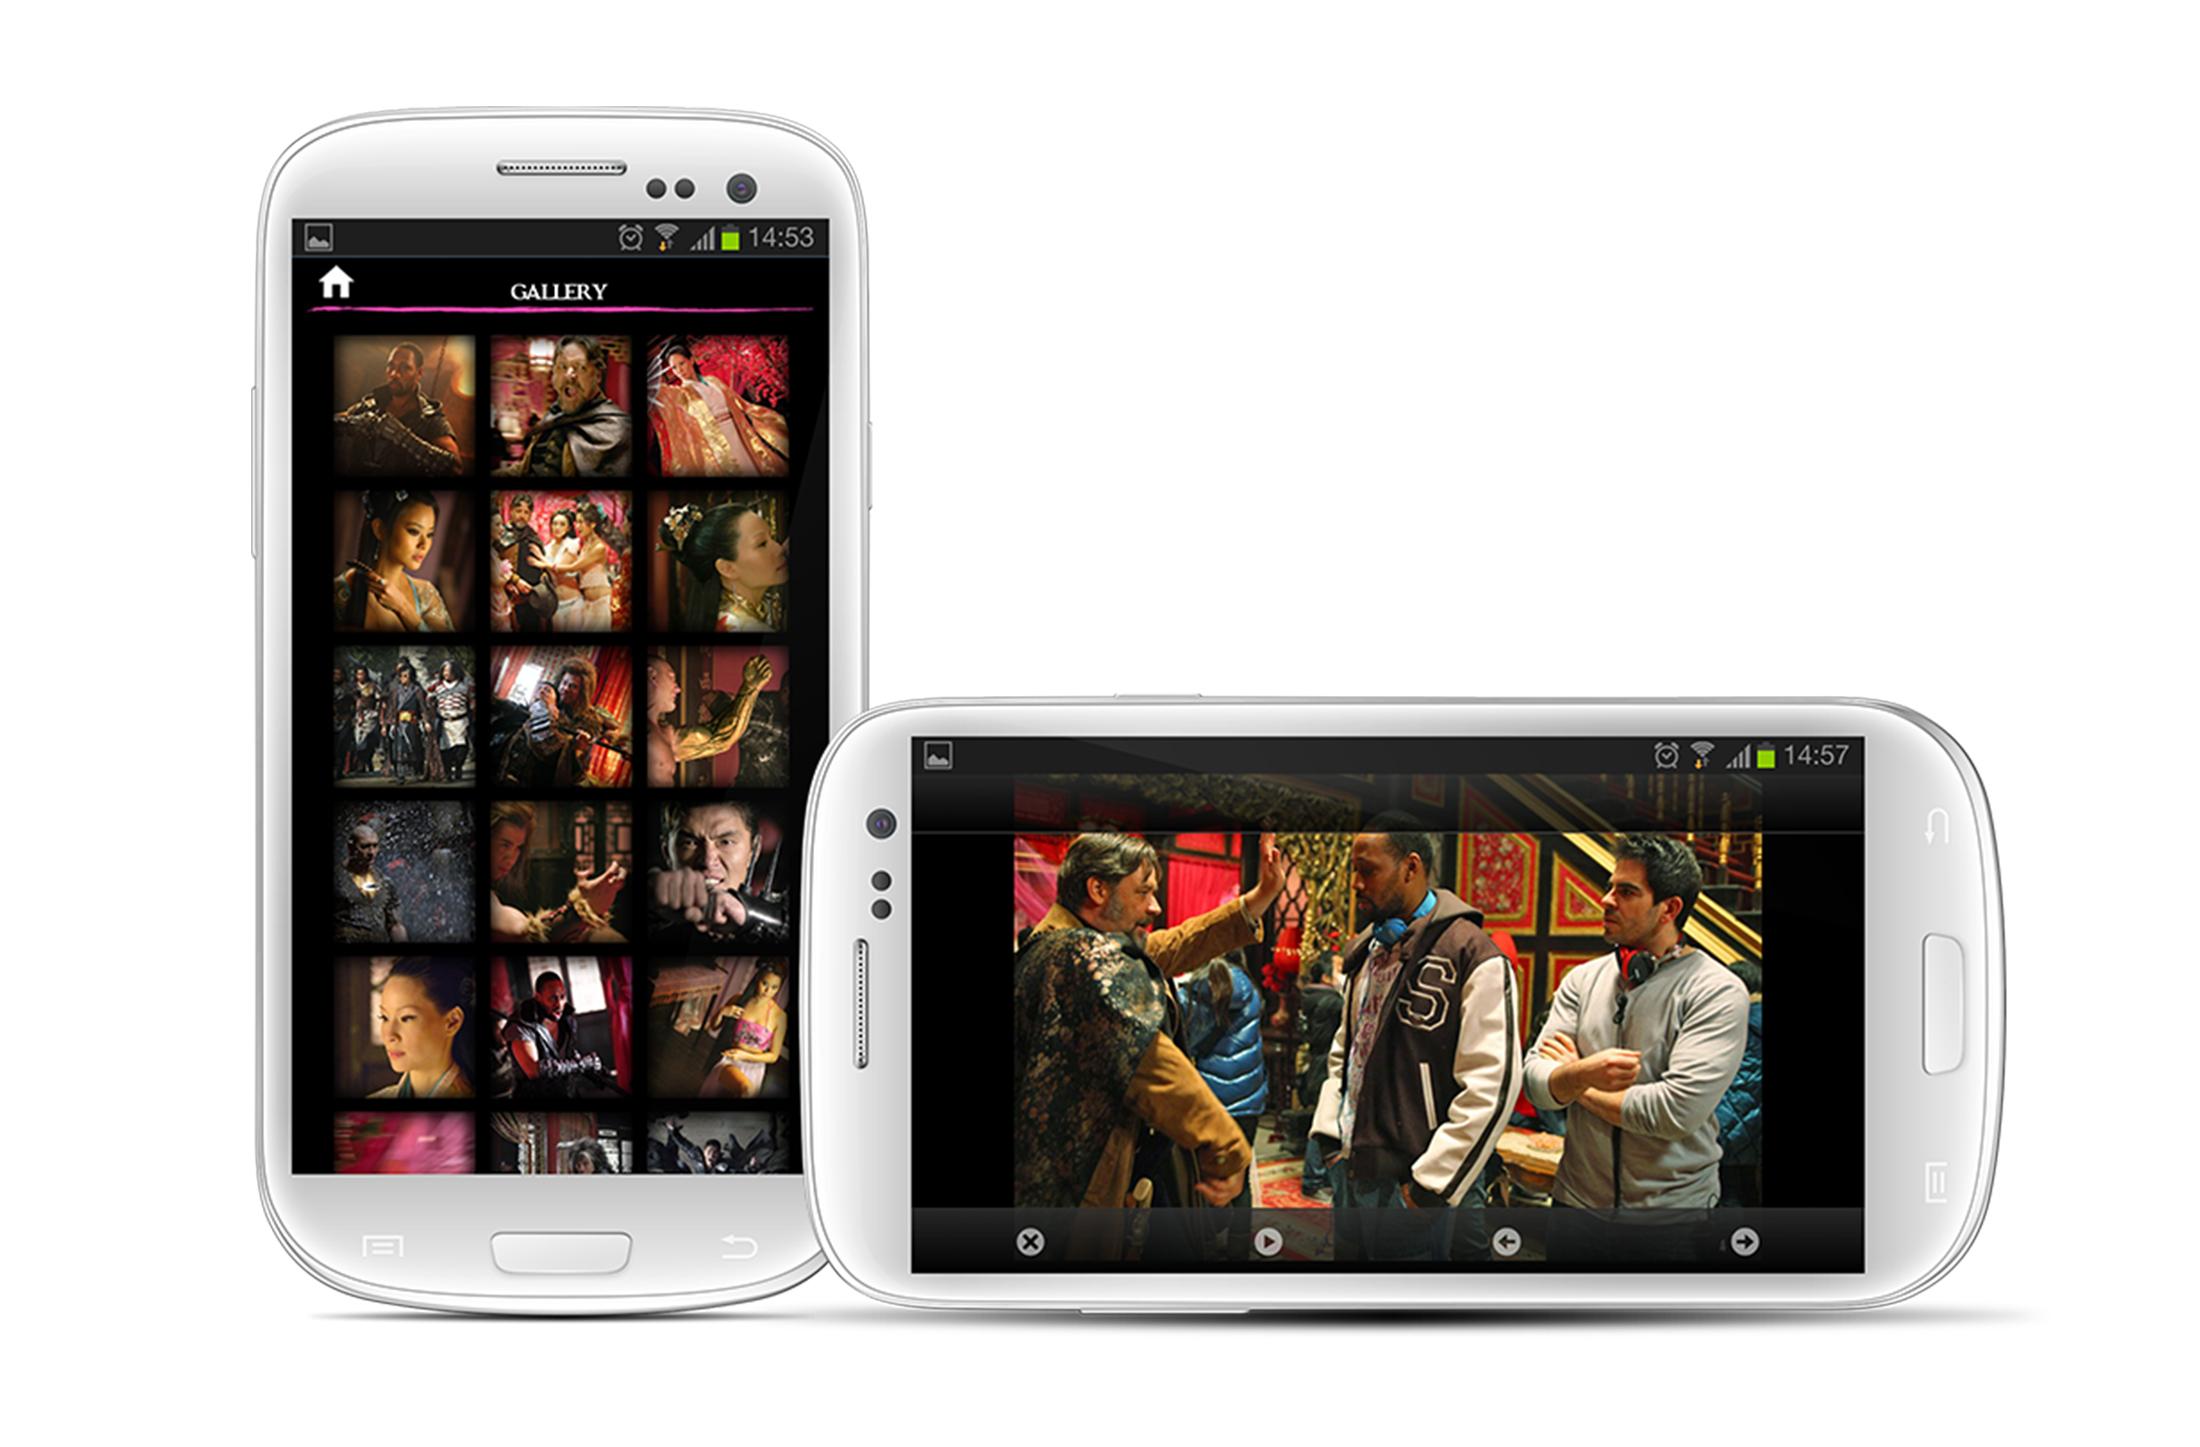 Gallery screen in portrait and fullscreen landscape mode.